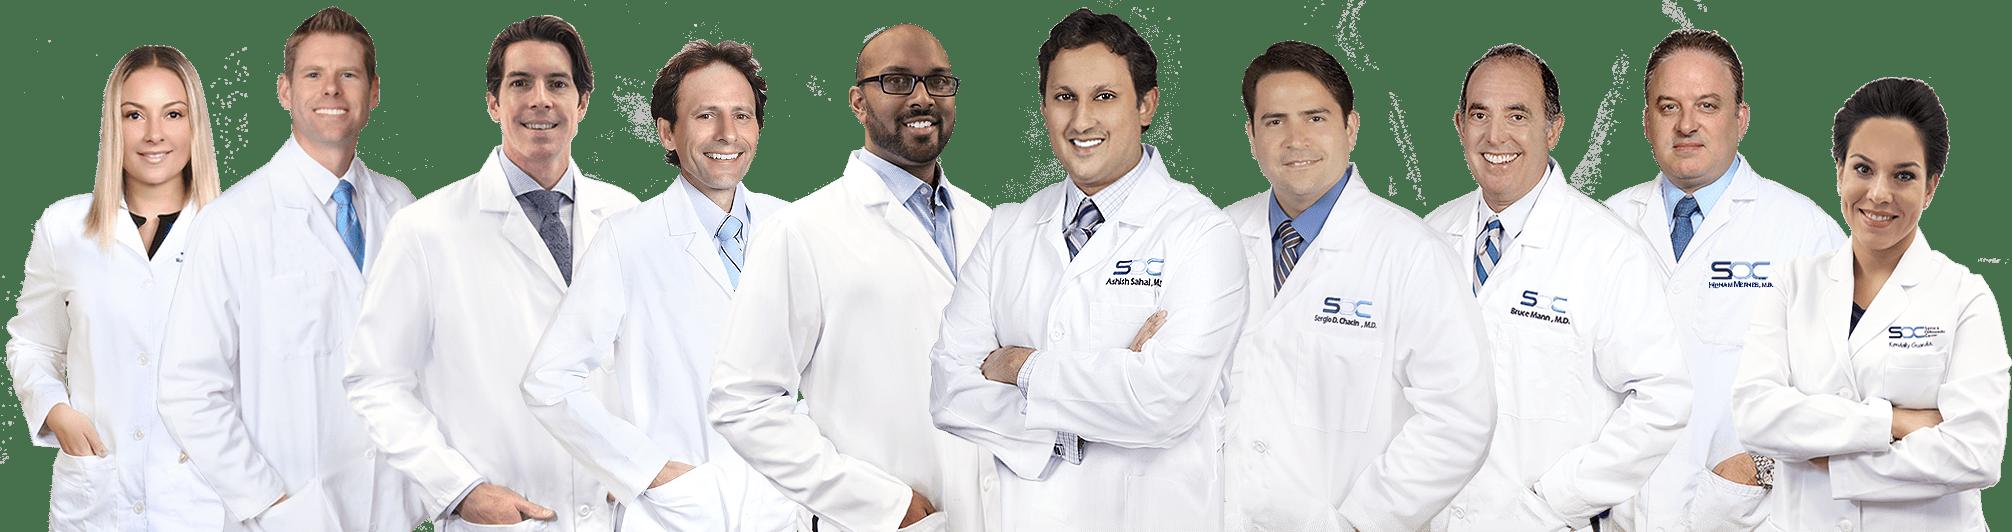 orthopedic doctors in broward & palm beach